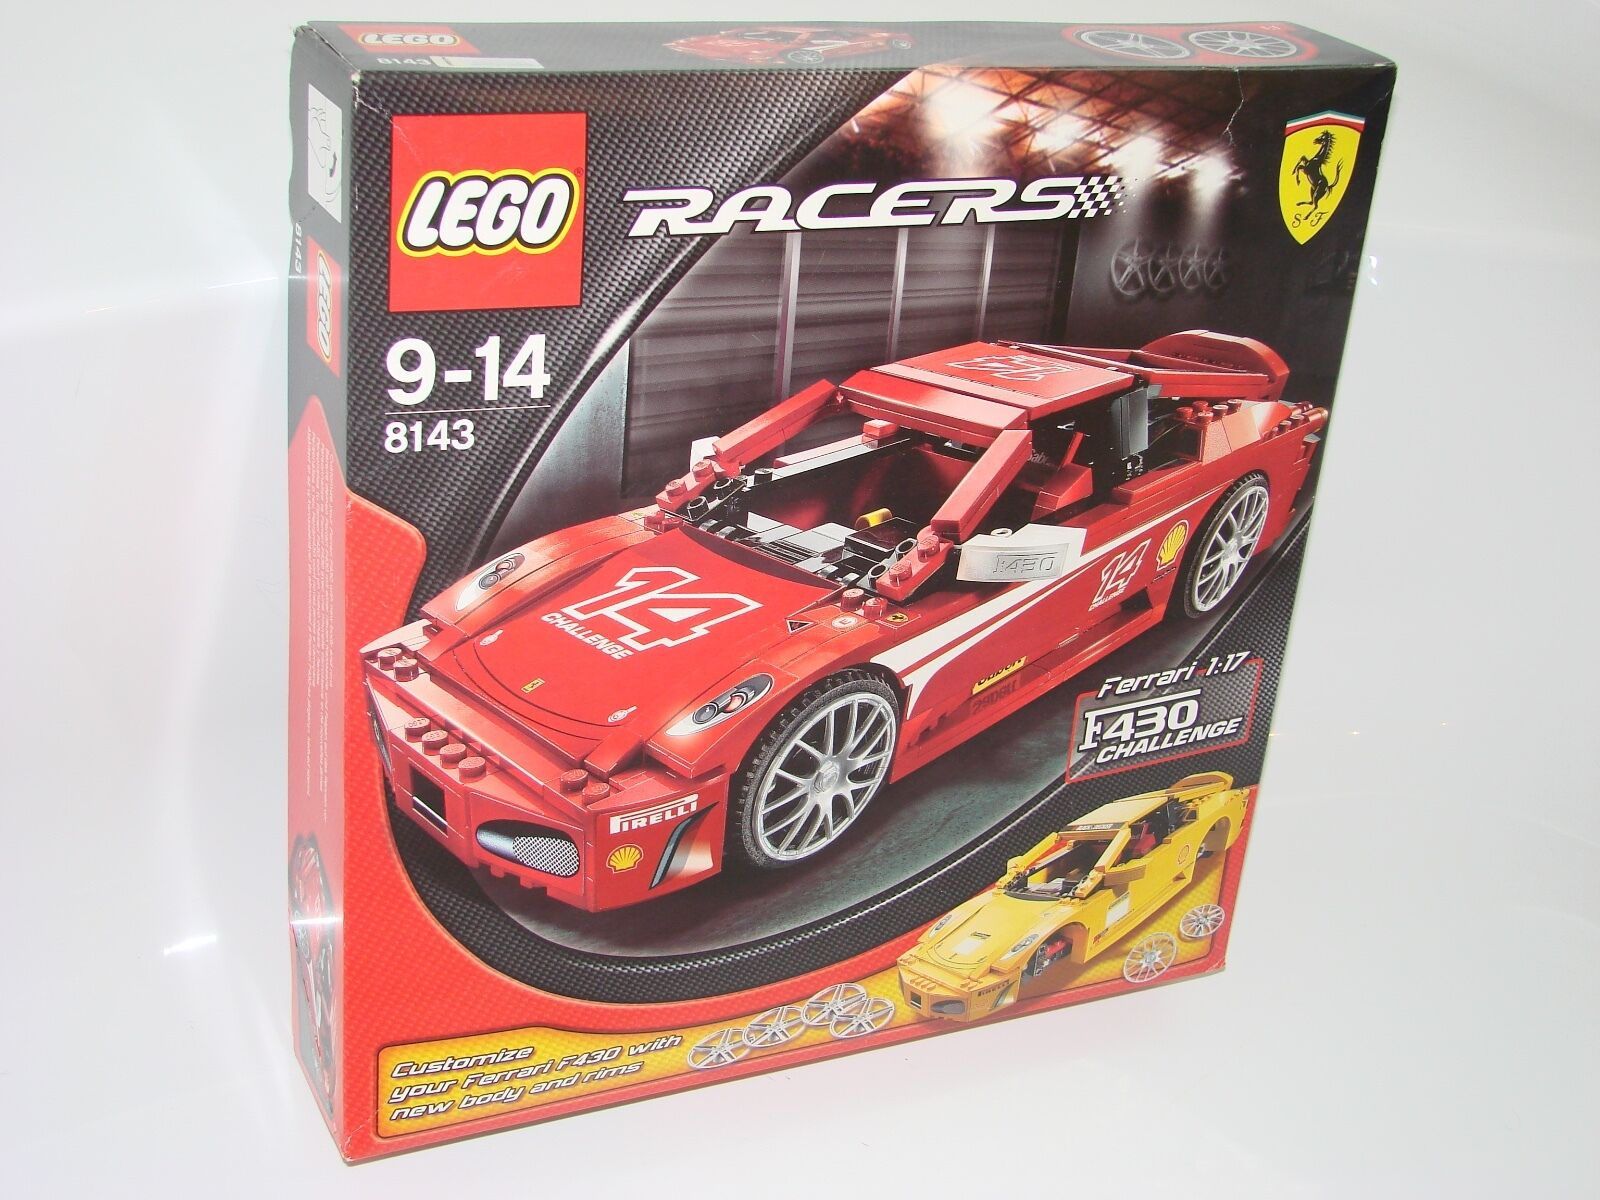 LEGO ® Racers 8143 FERRARI 1:17 f430 CHALLENGE NUOVO OVP NEW MISB NRFB